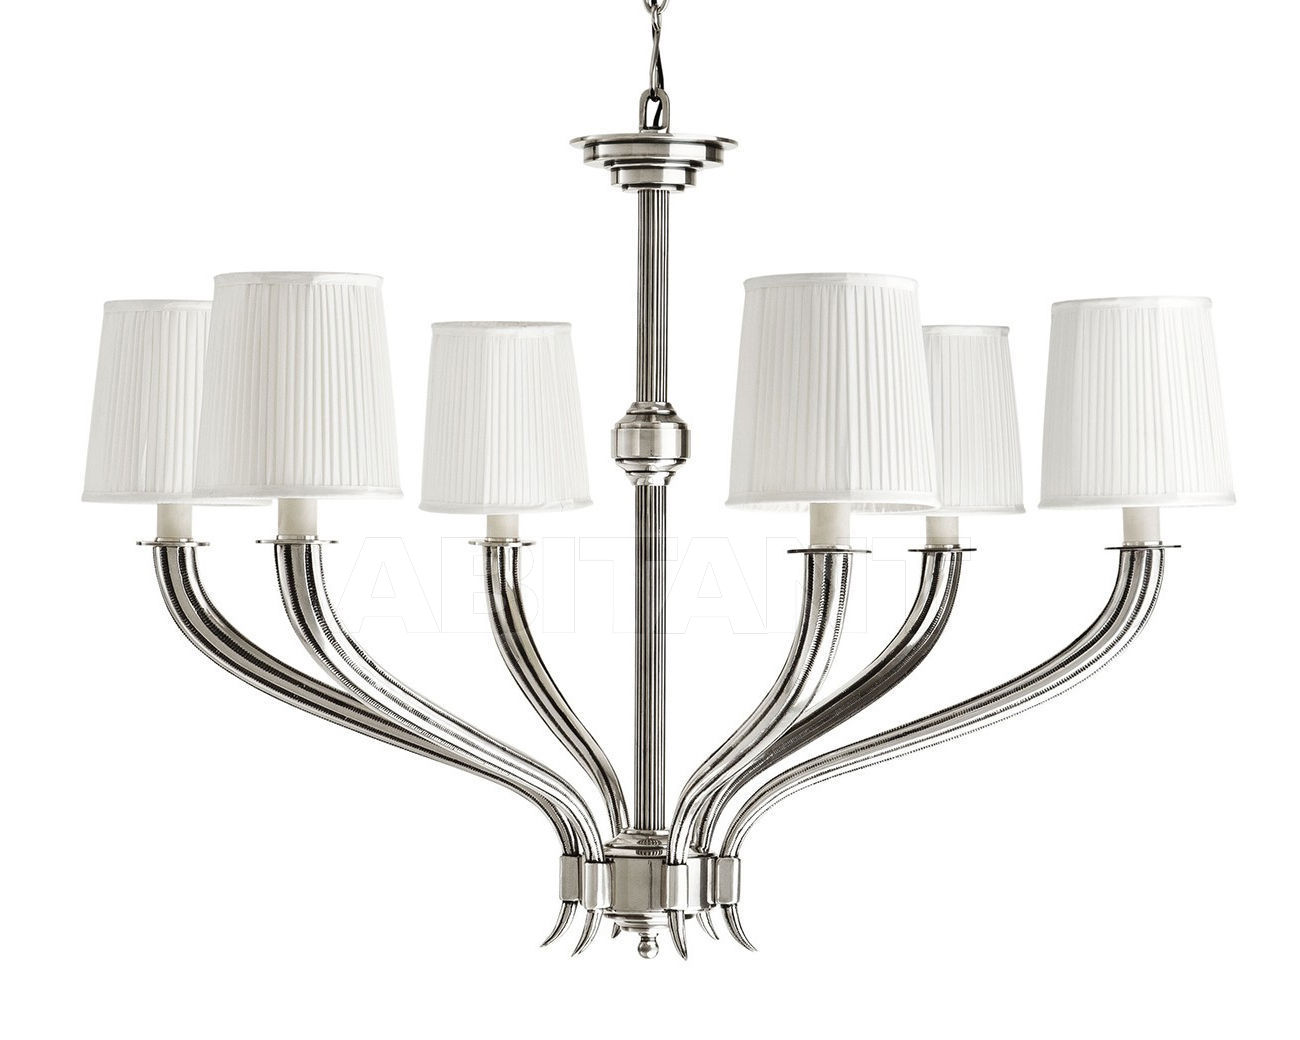 Купить Люстра Mayflower Eichholtz  Lighting 108079